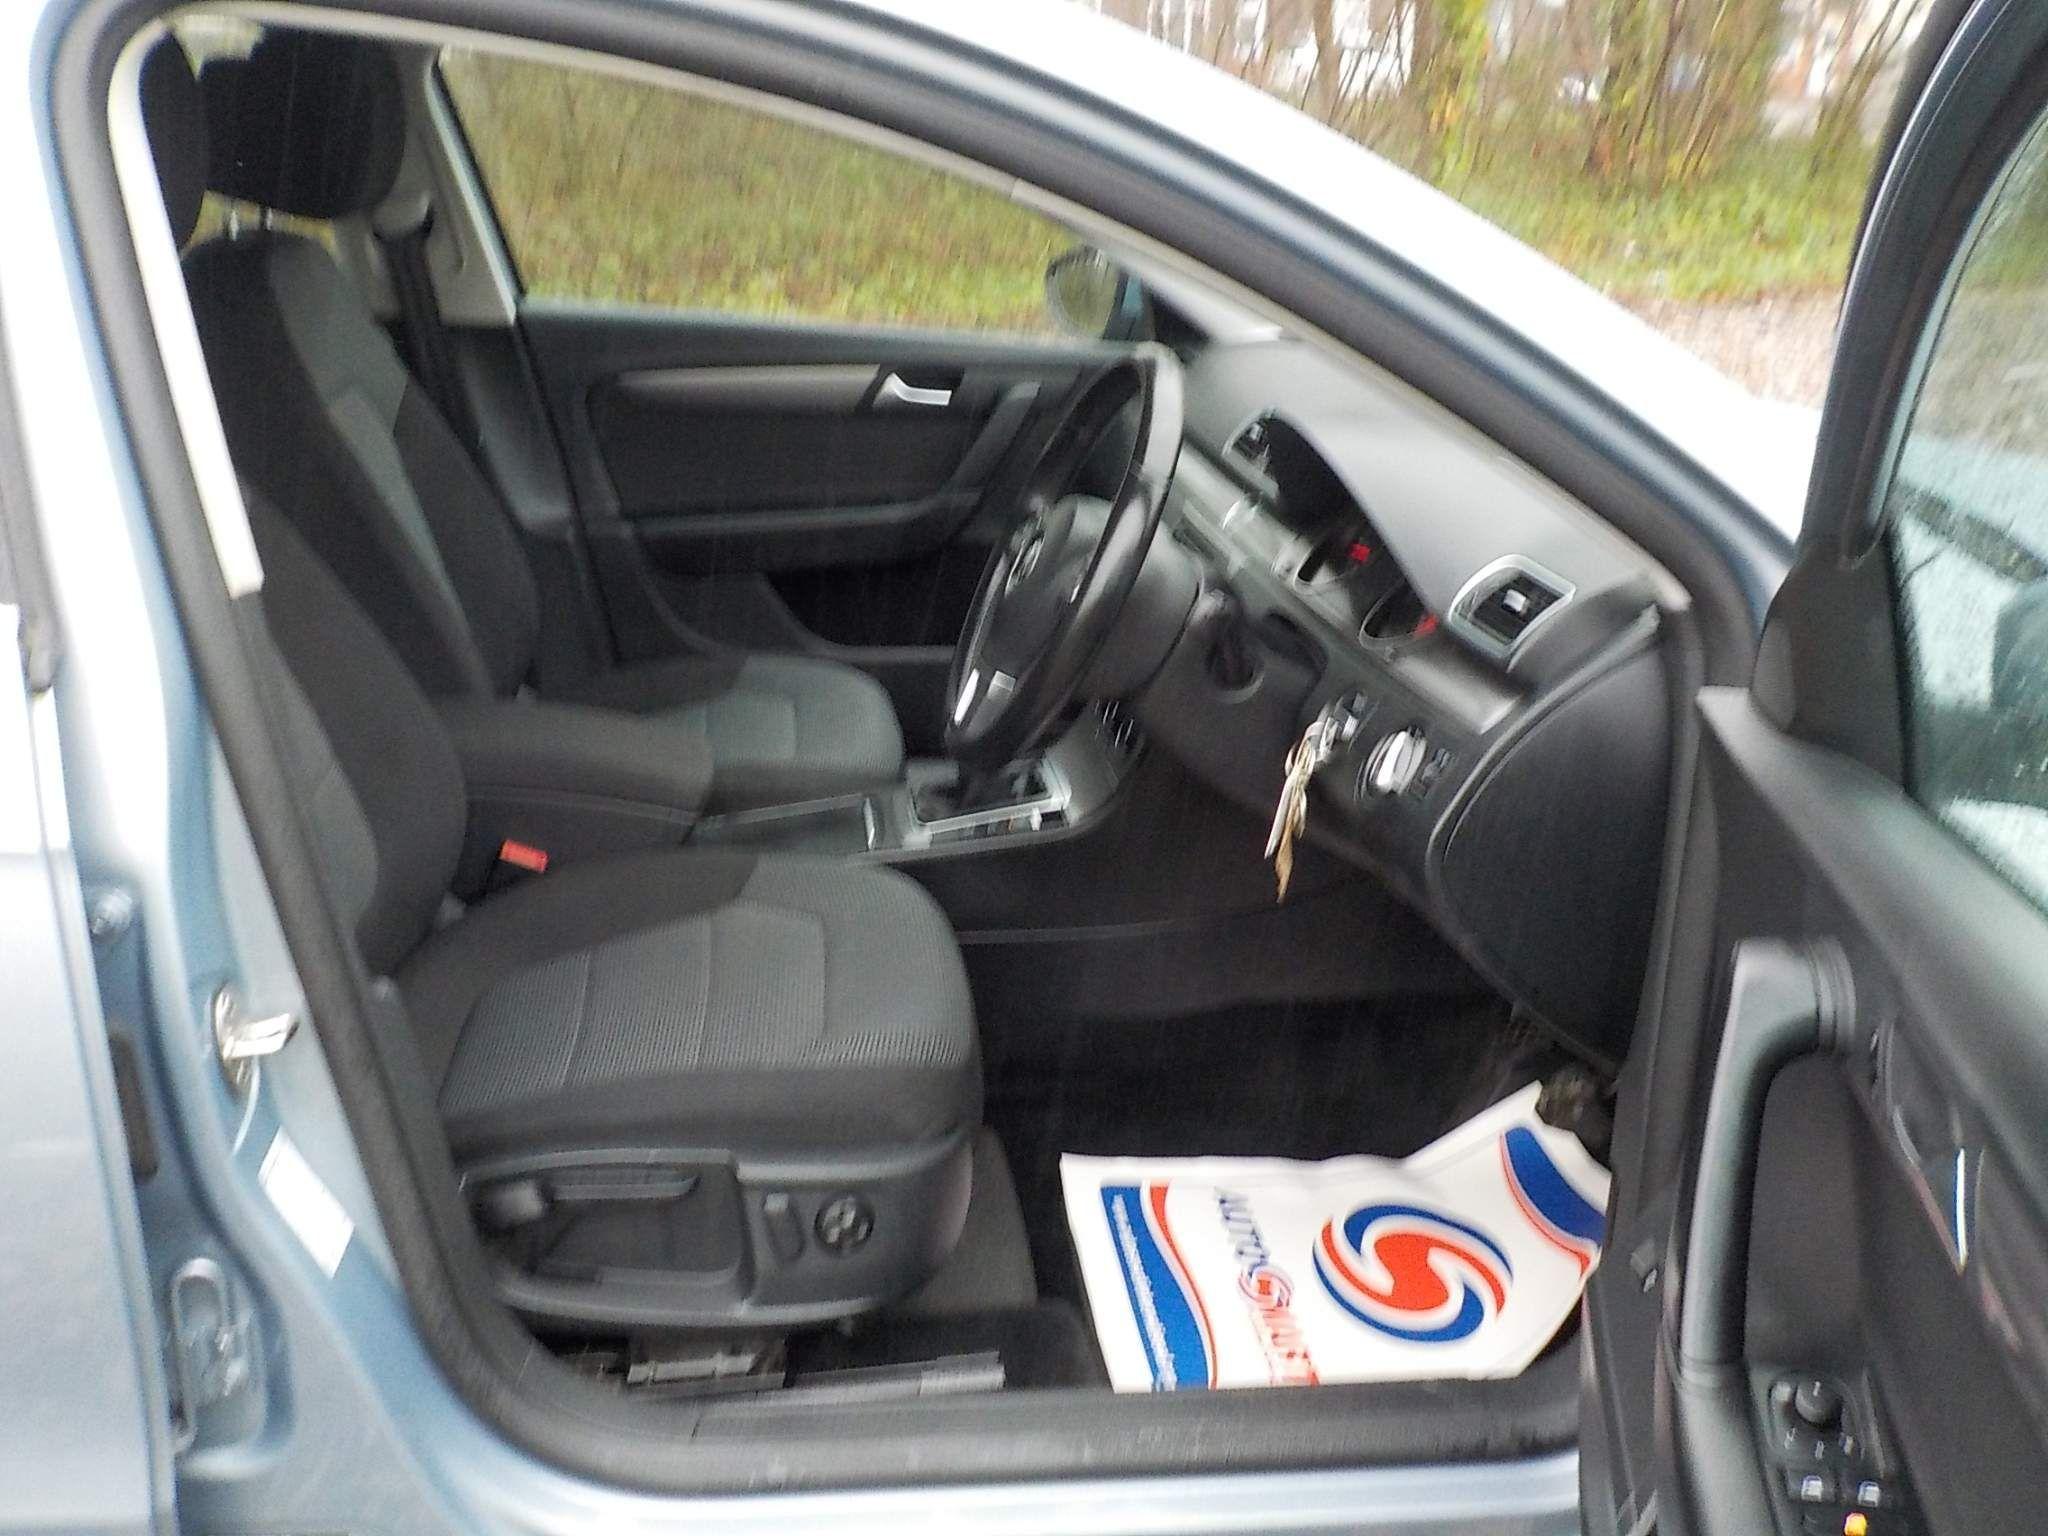 Volkswagen Passat 2.0 TDI BlueMotion Tech SE 4dr